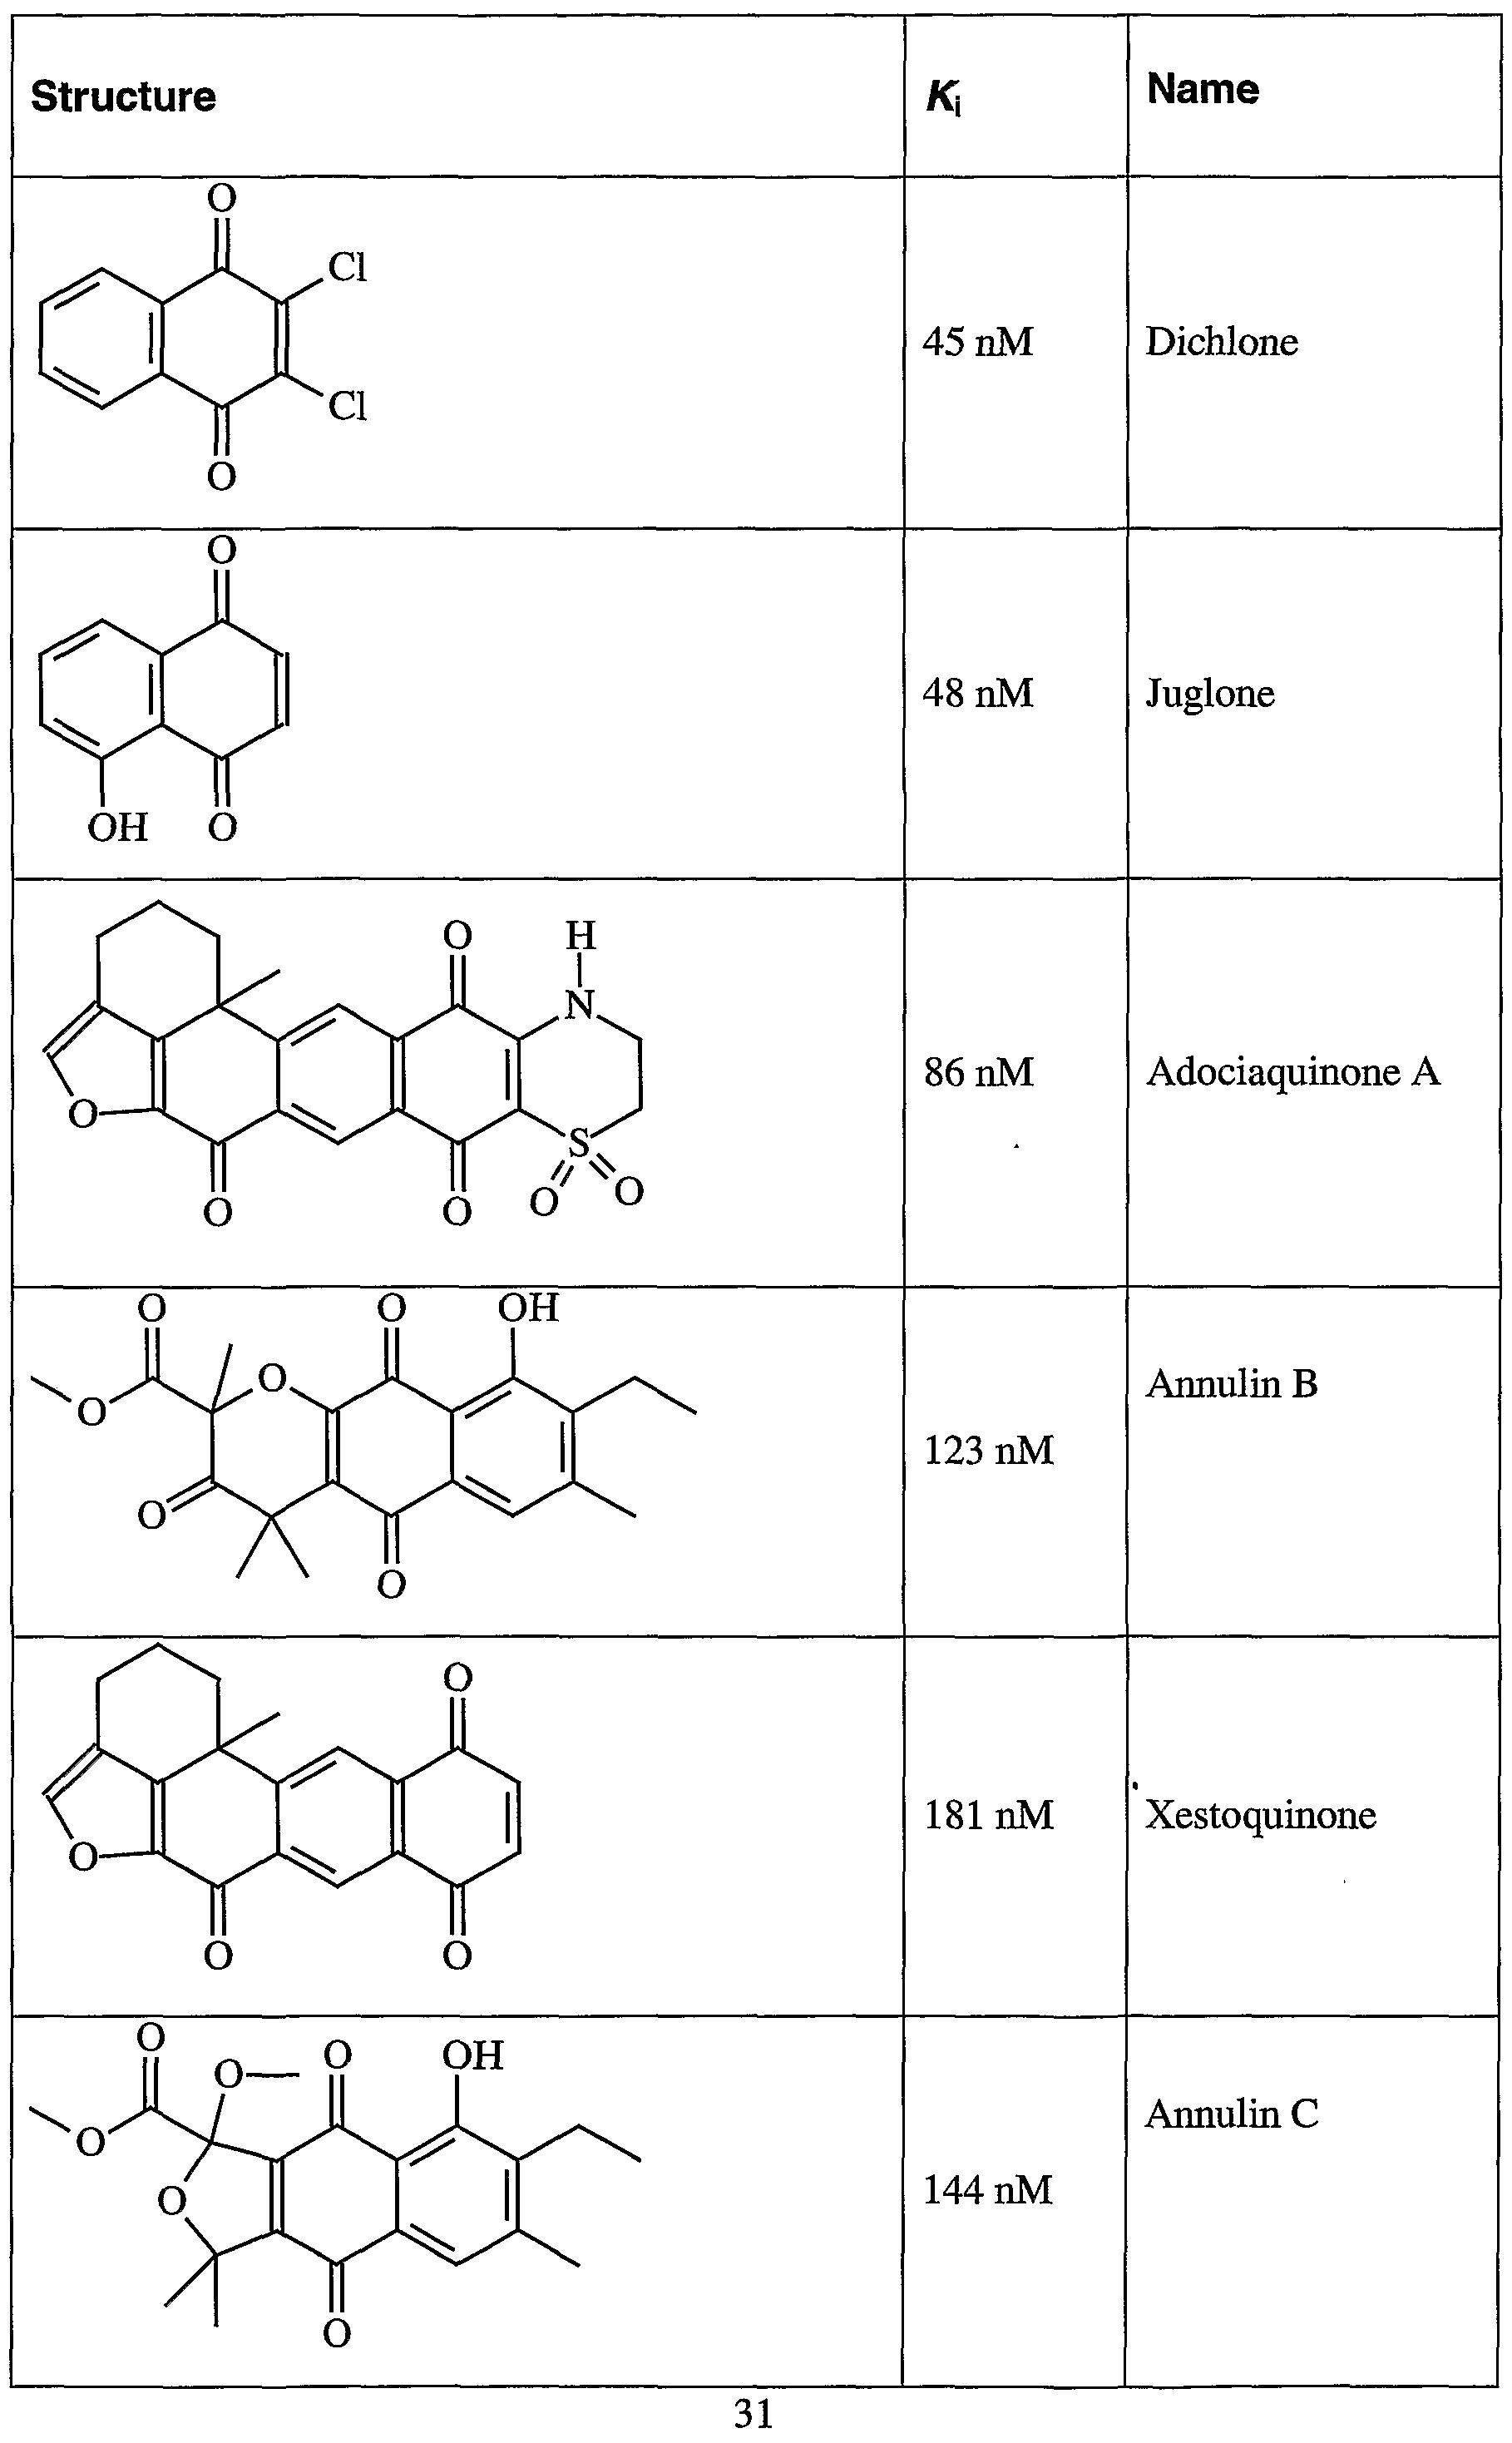 valtrex toxicity